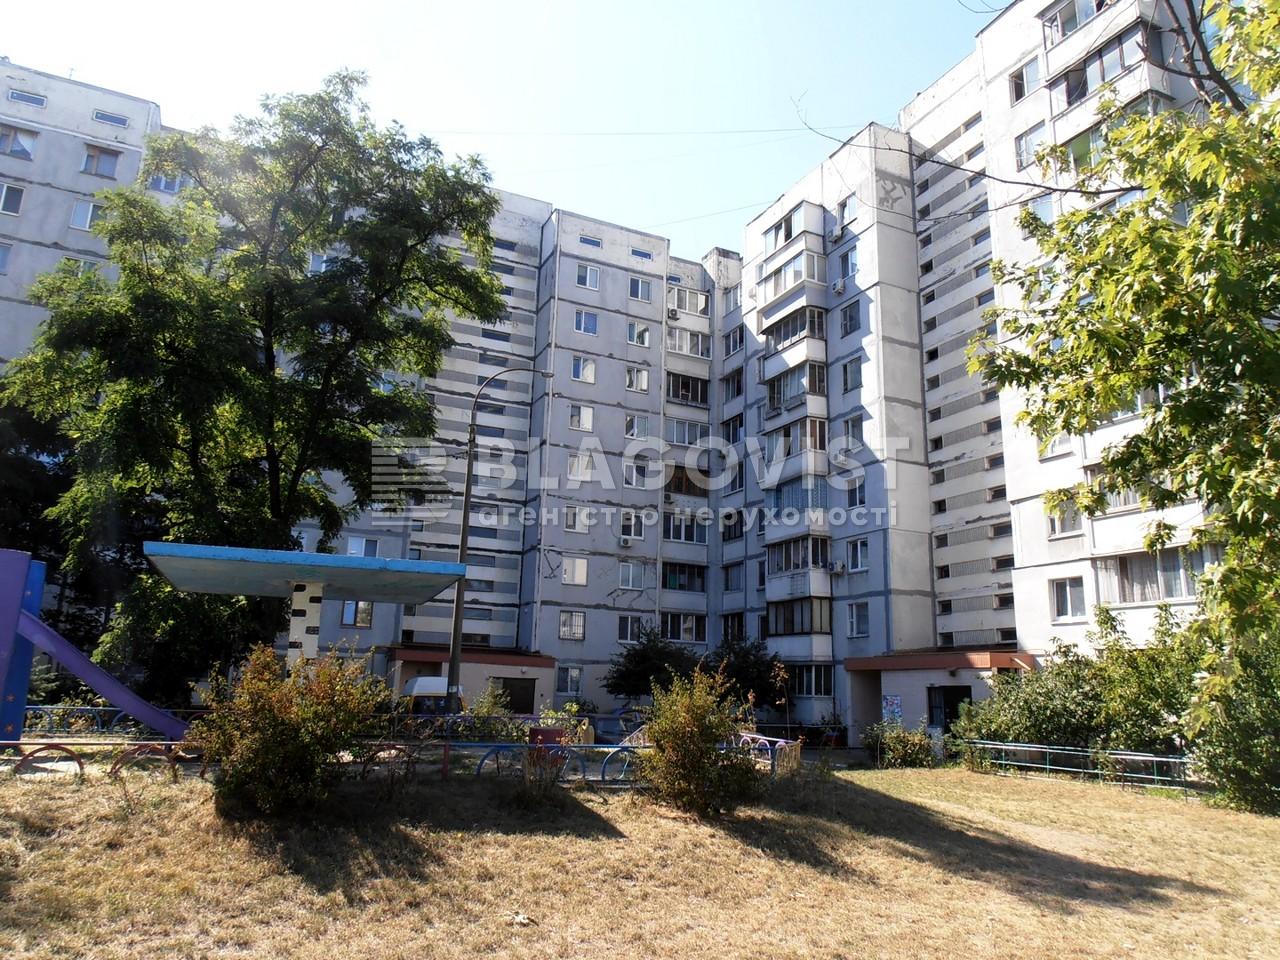 Квартира A-103835, Закревского Николая, 47б, Киев - Фото 2